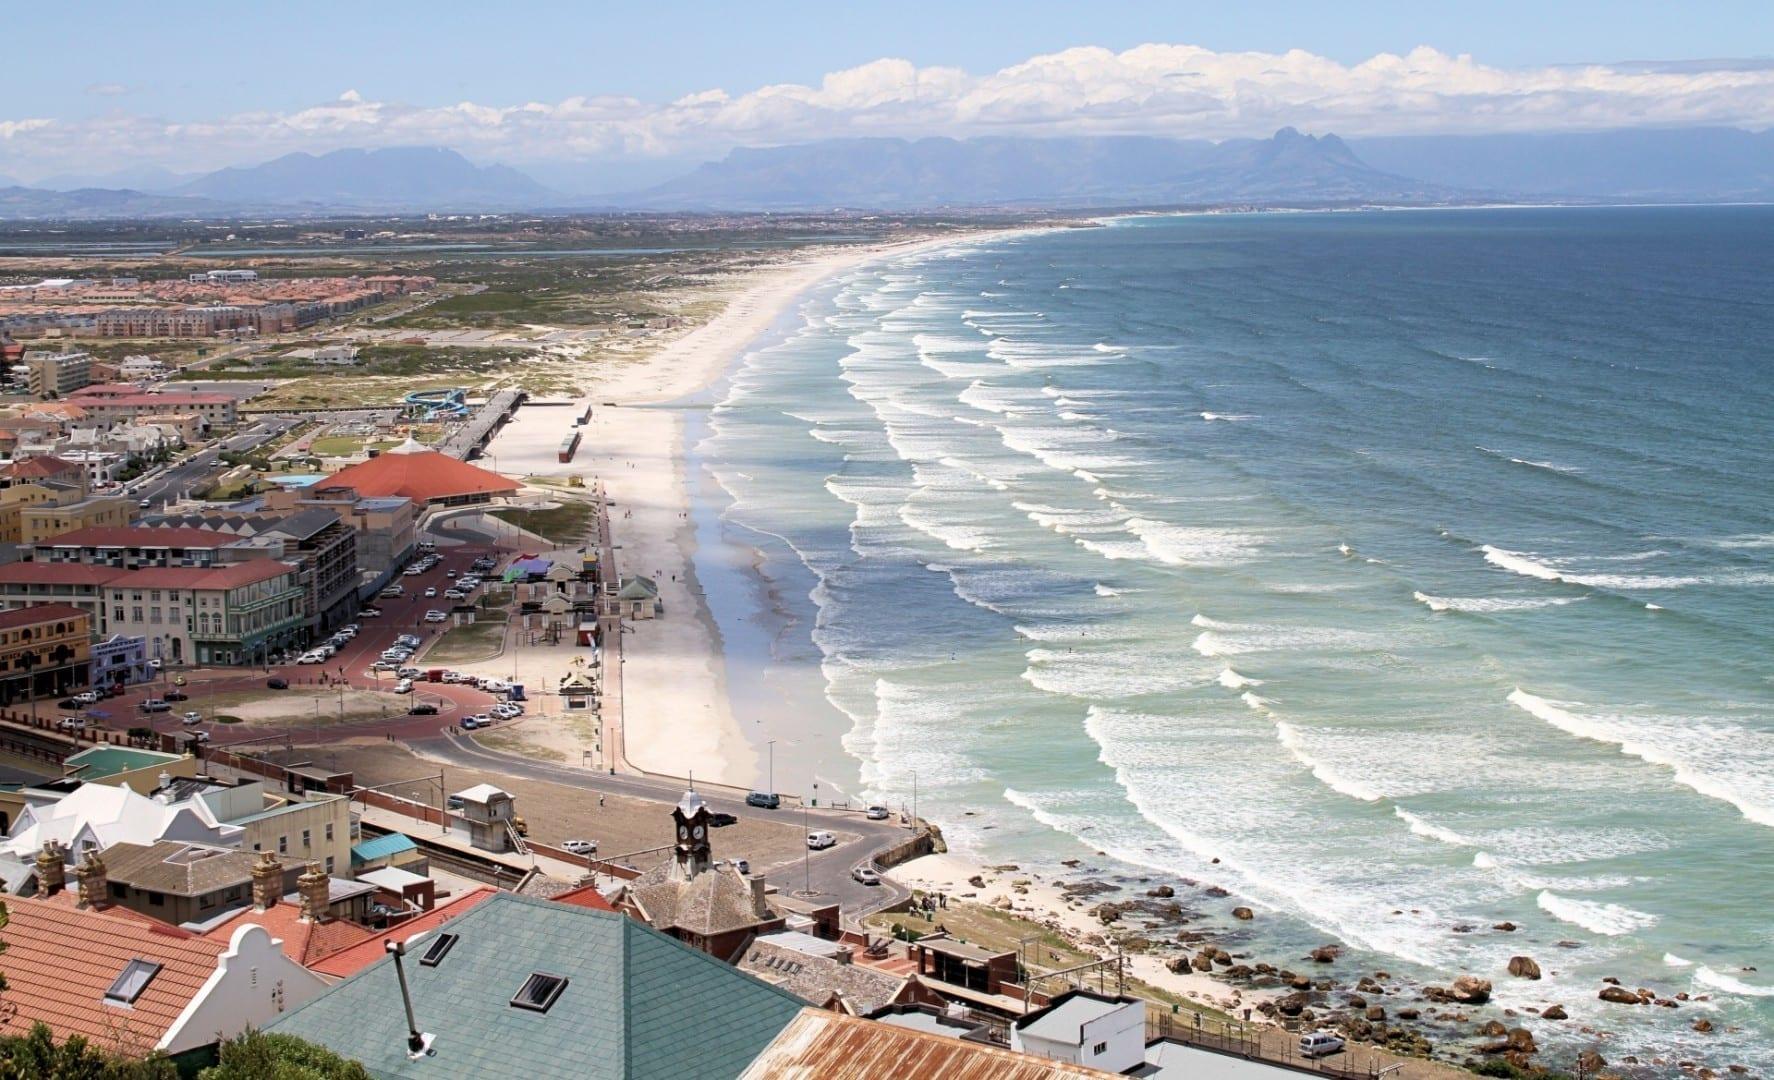 Muizenberg de Boyes Drive Muizenberg República de Sudáfrica